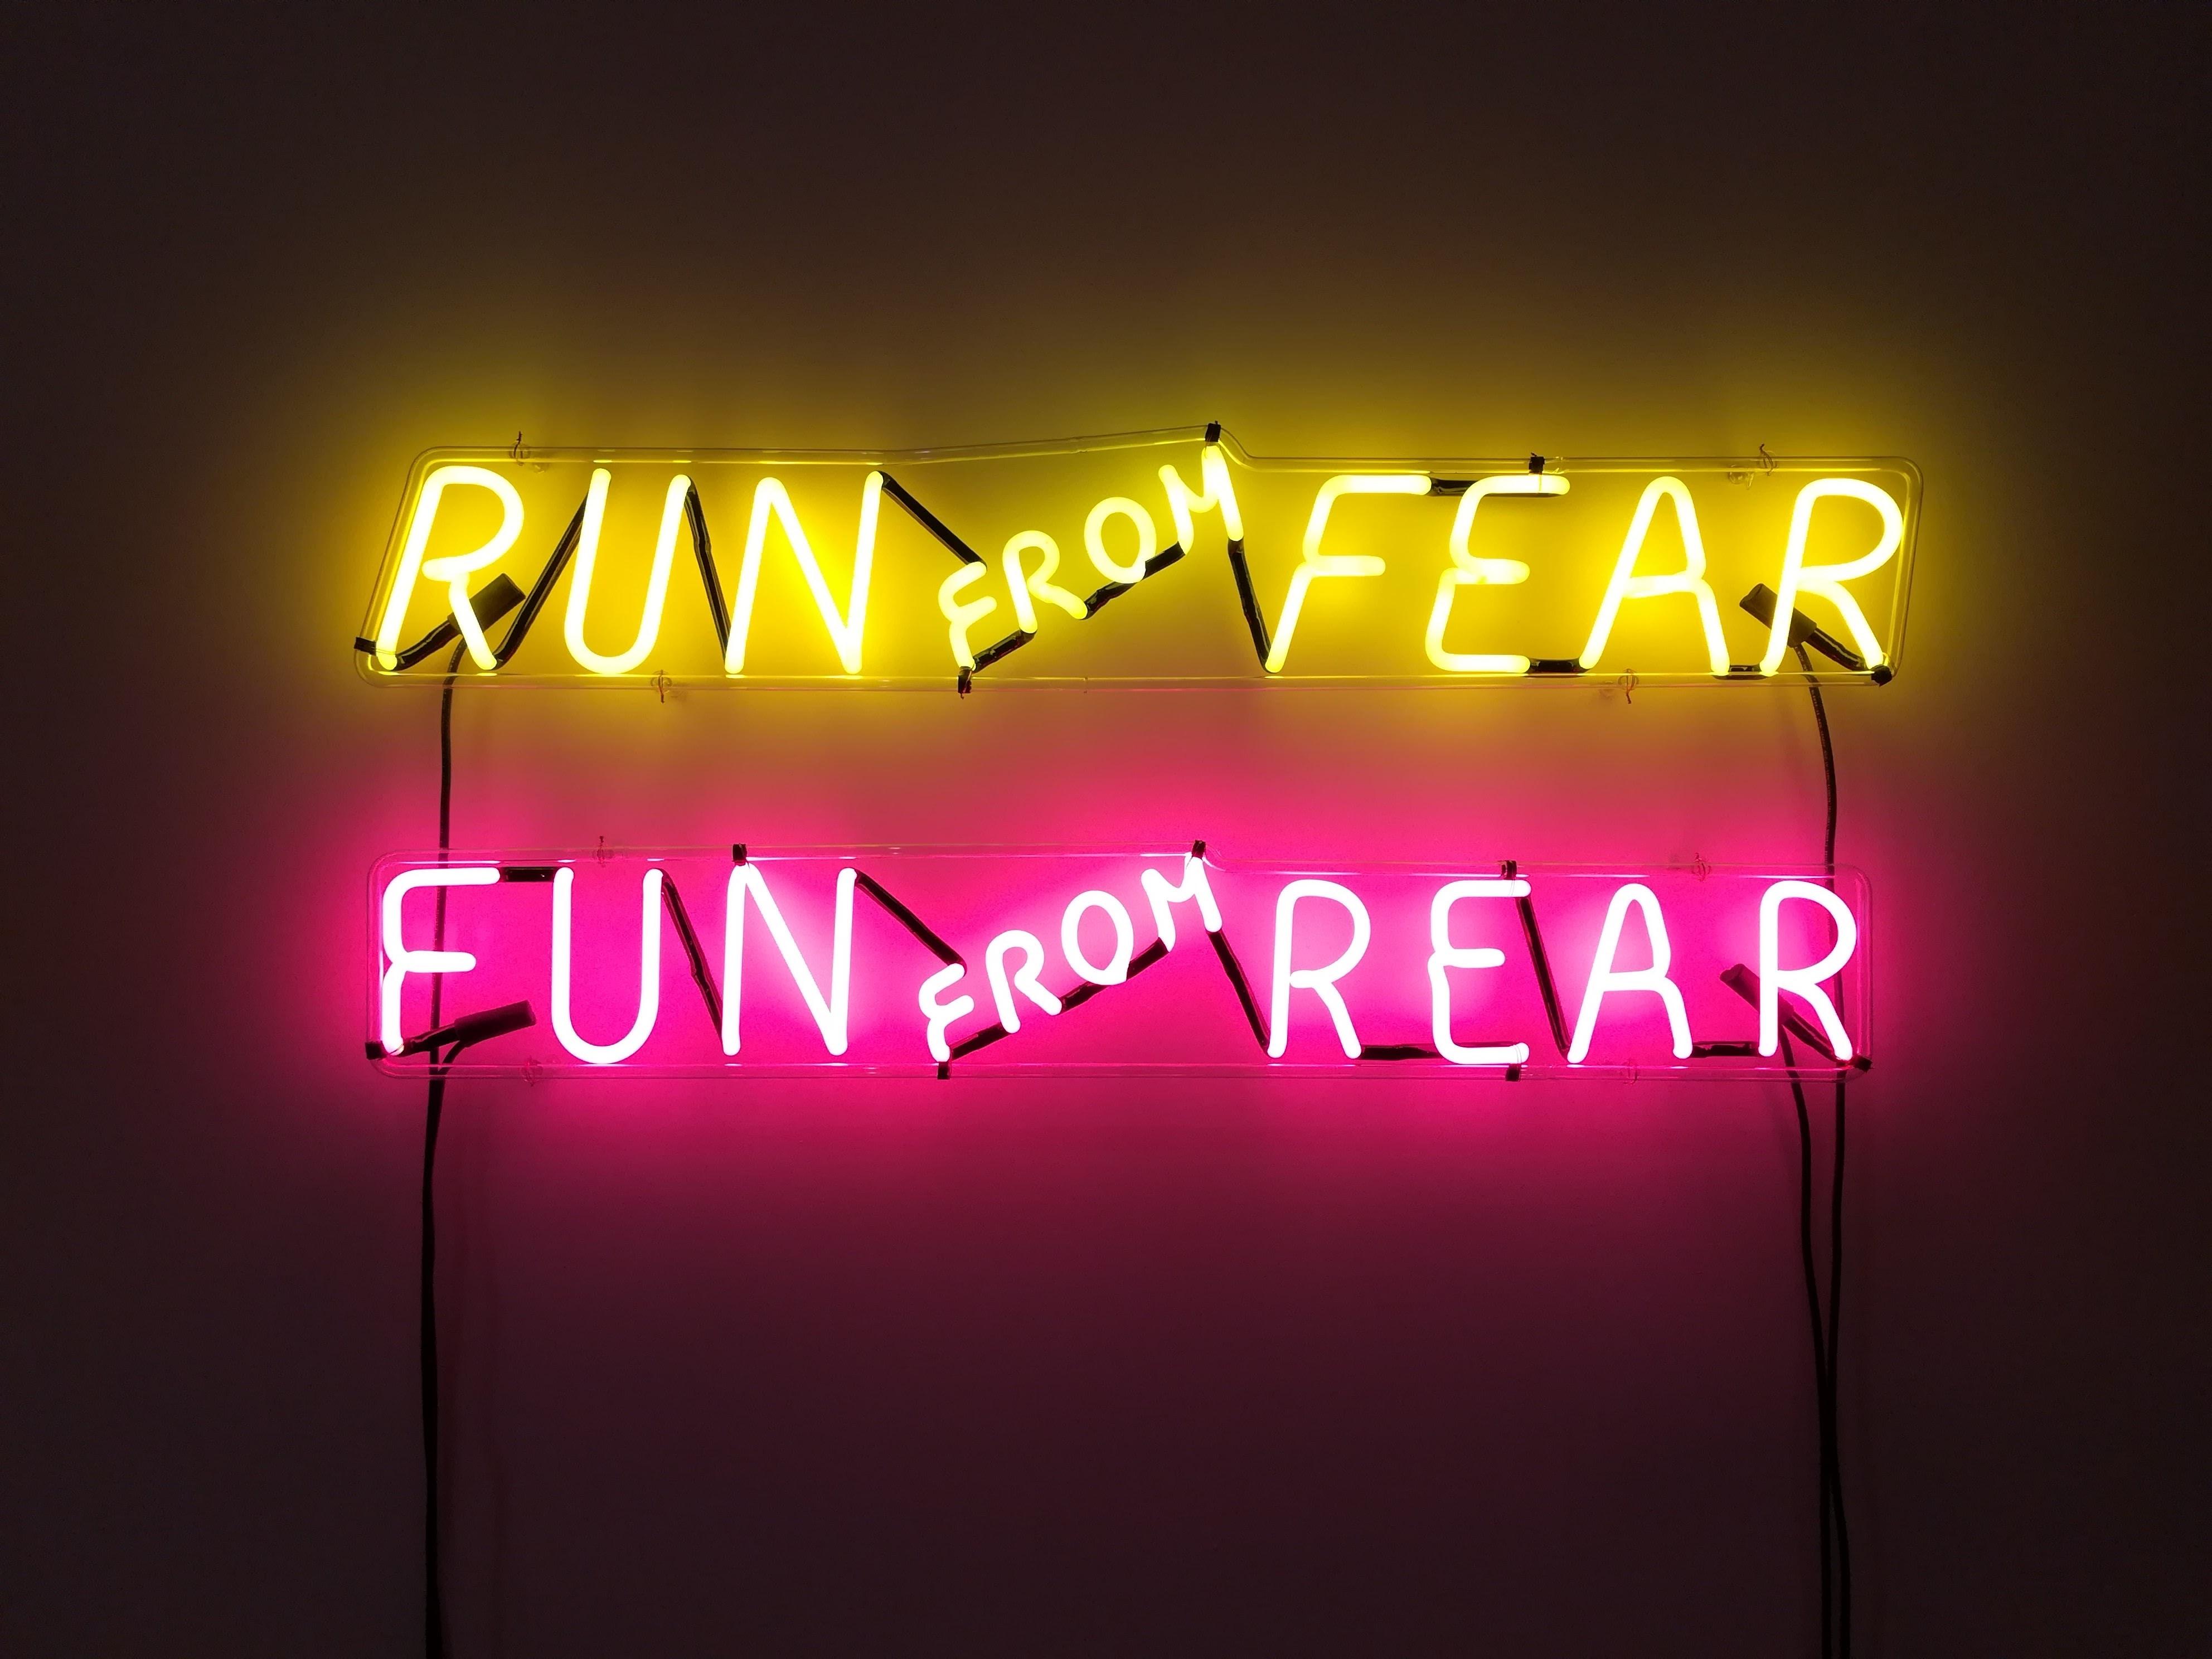 run frfom fear fun from rear LED signage